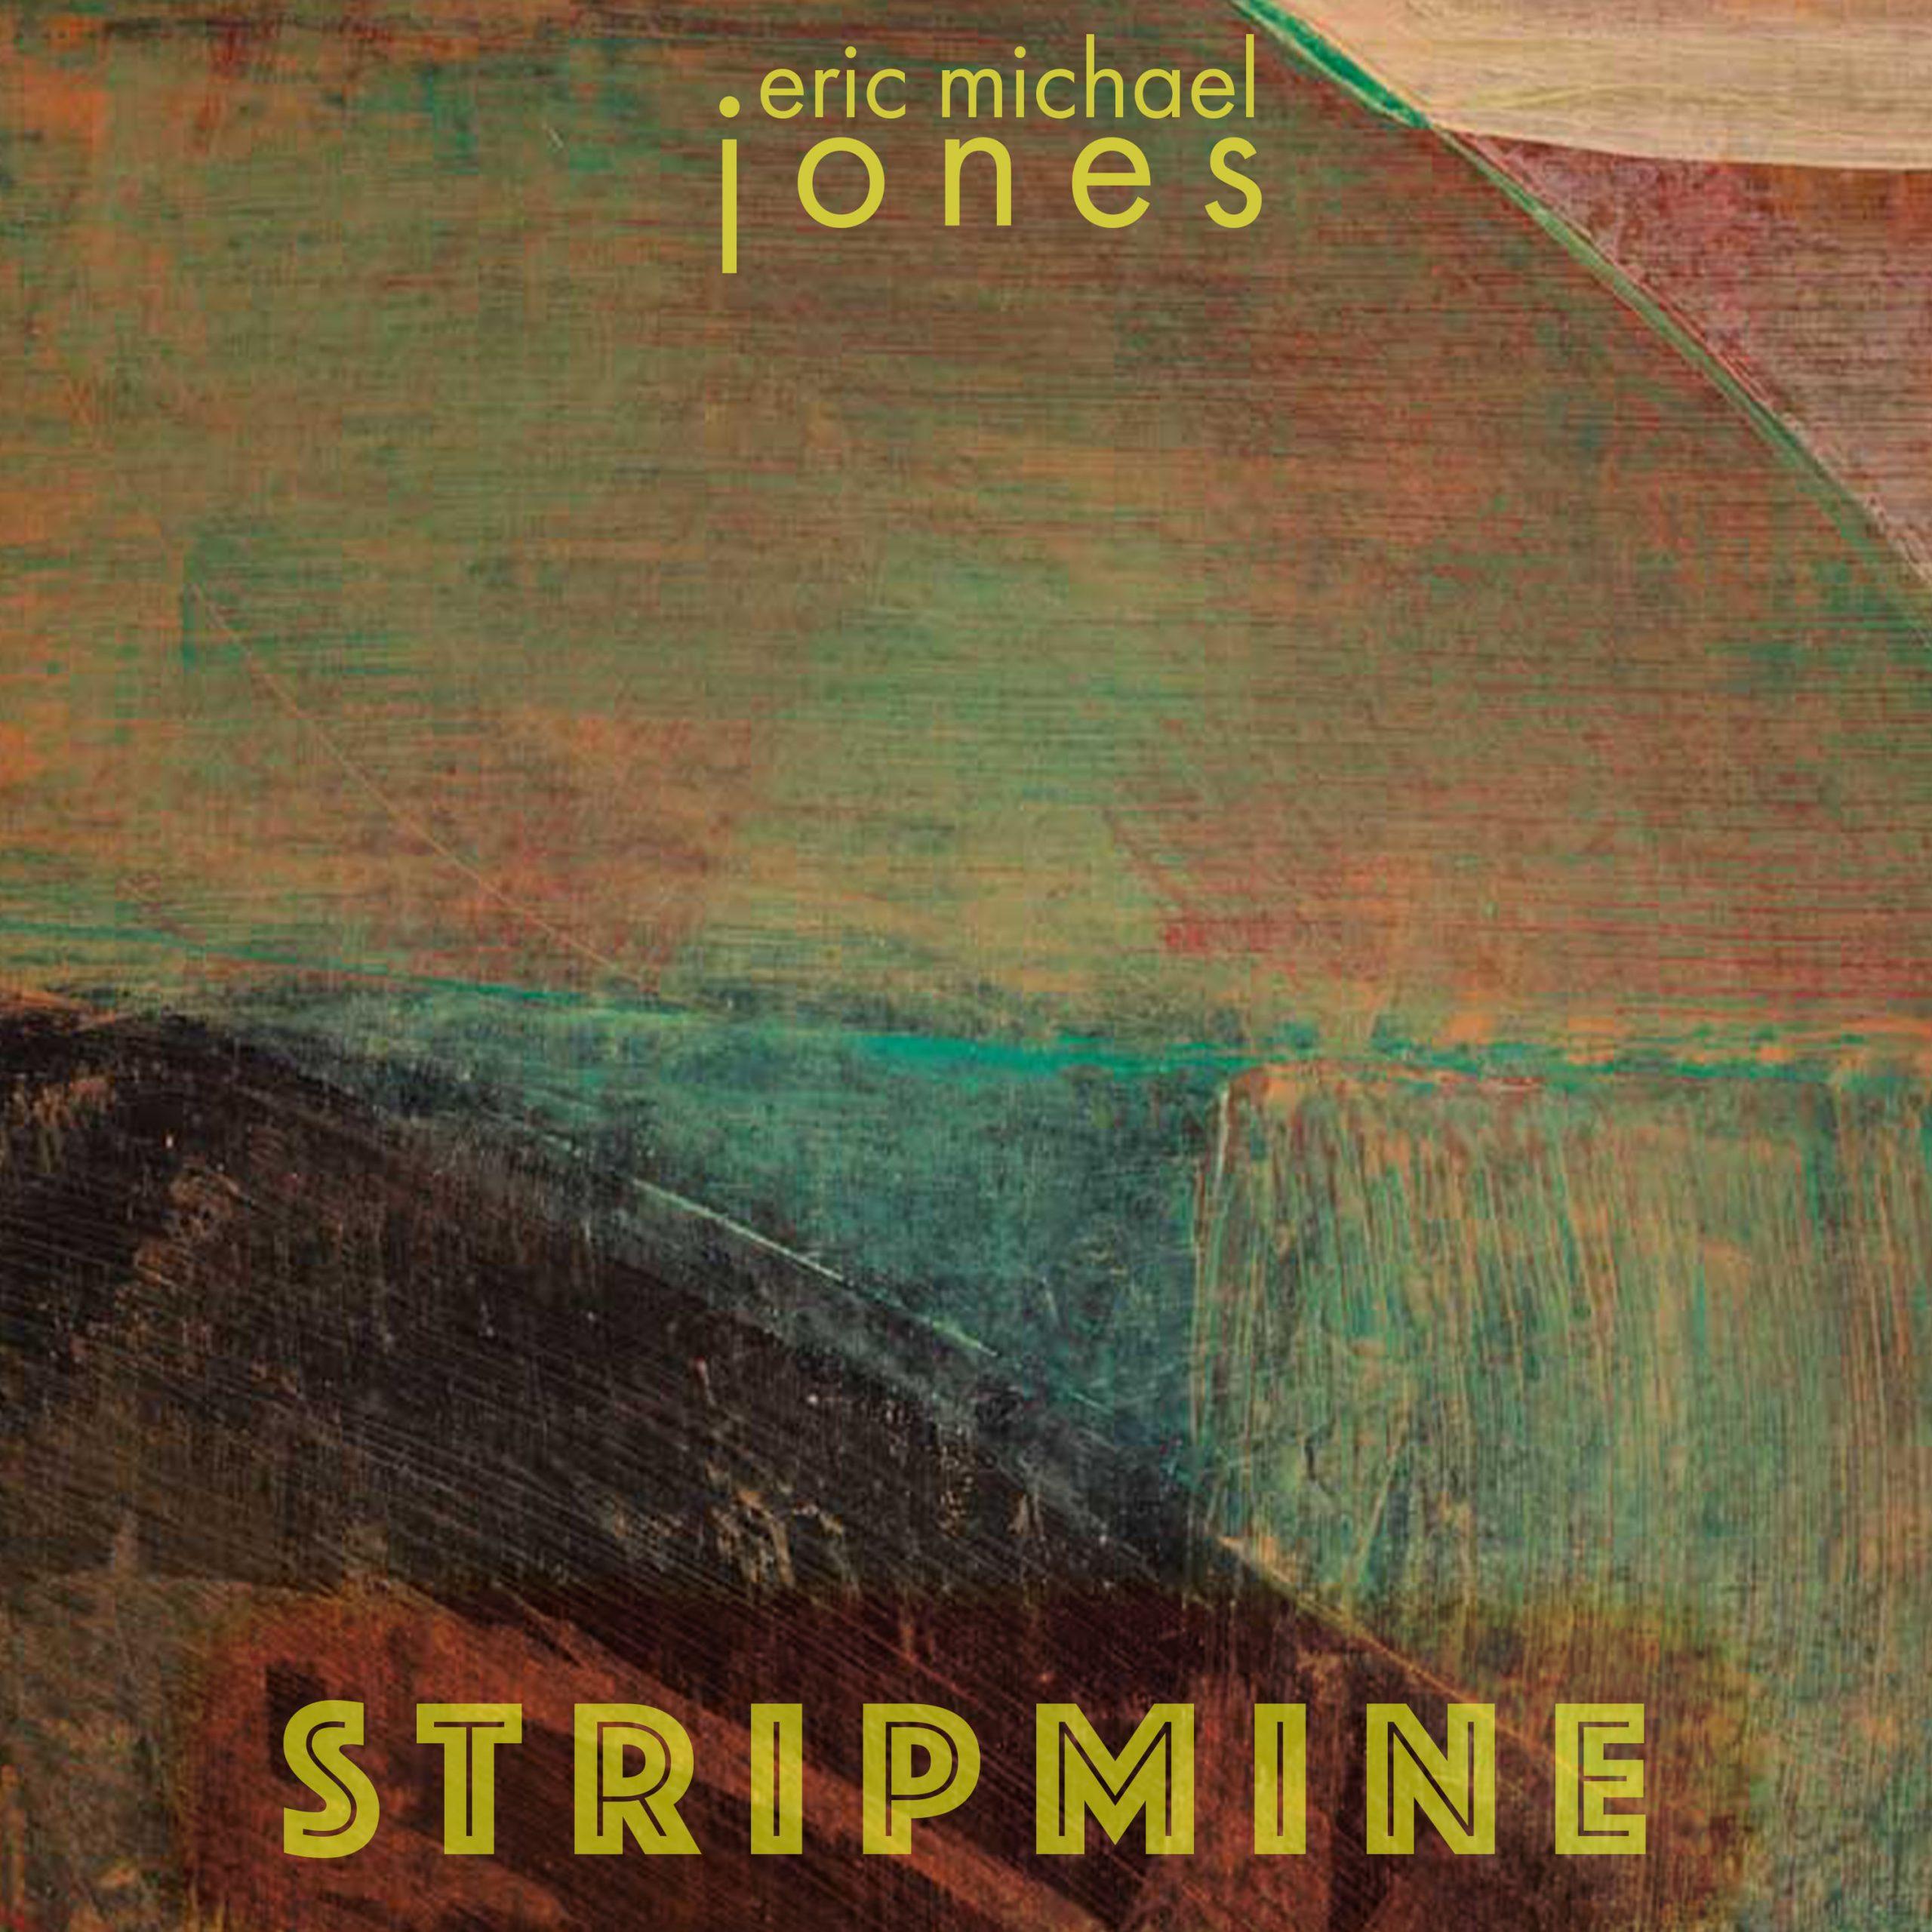 Stripmine by Eric Michael Jones